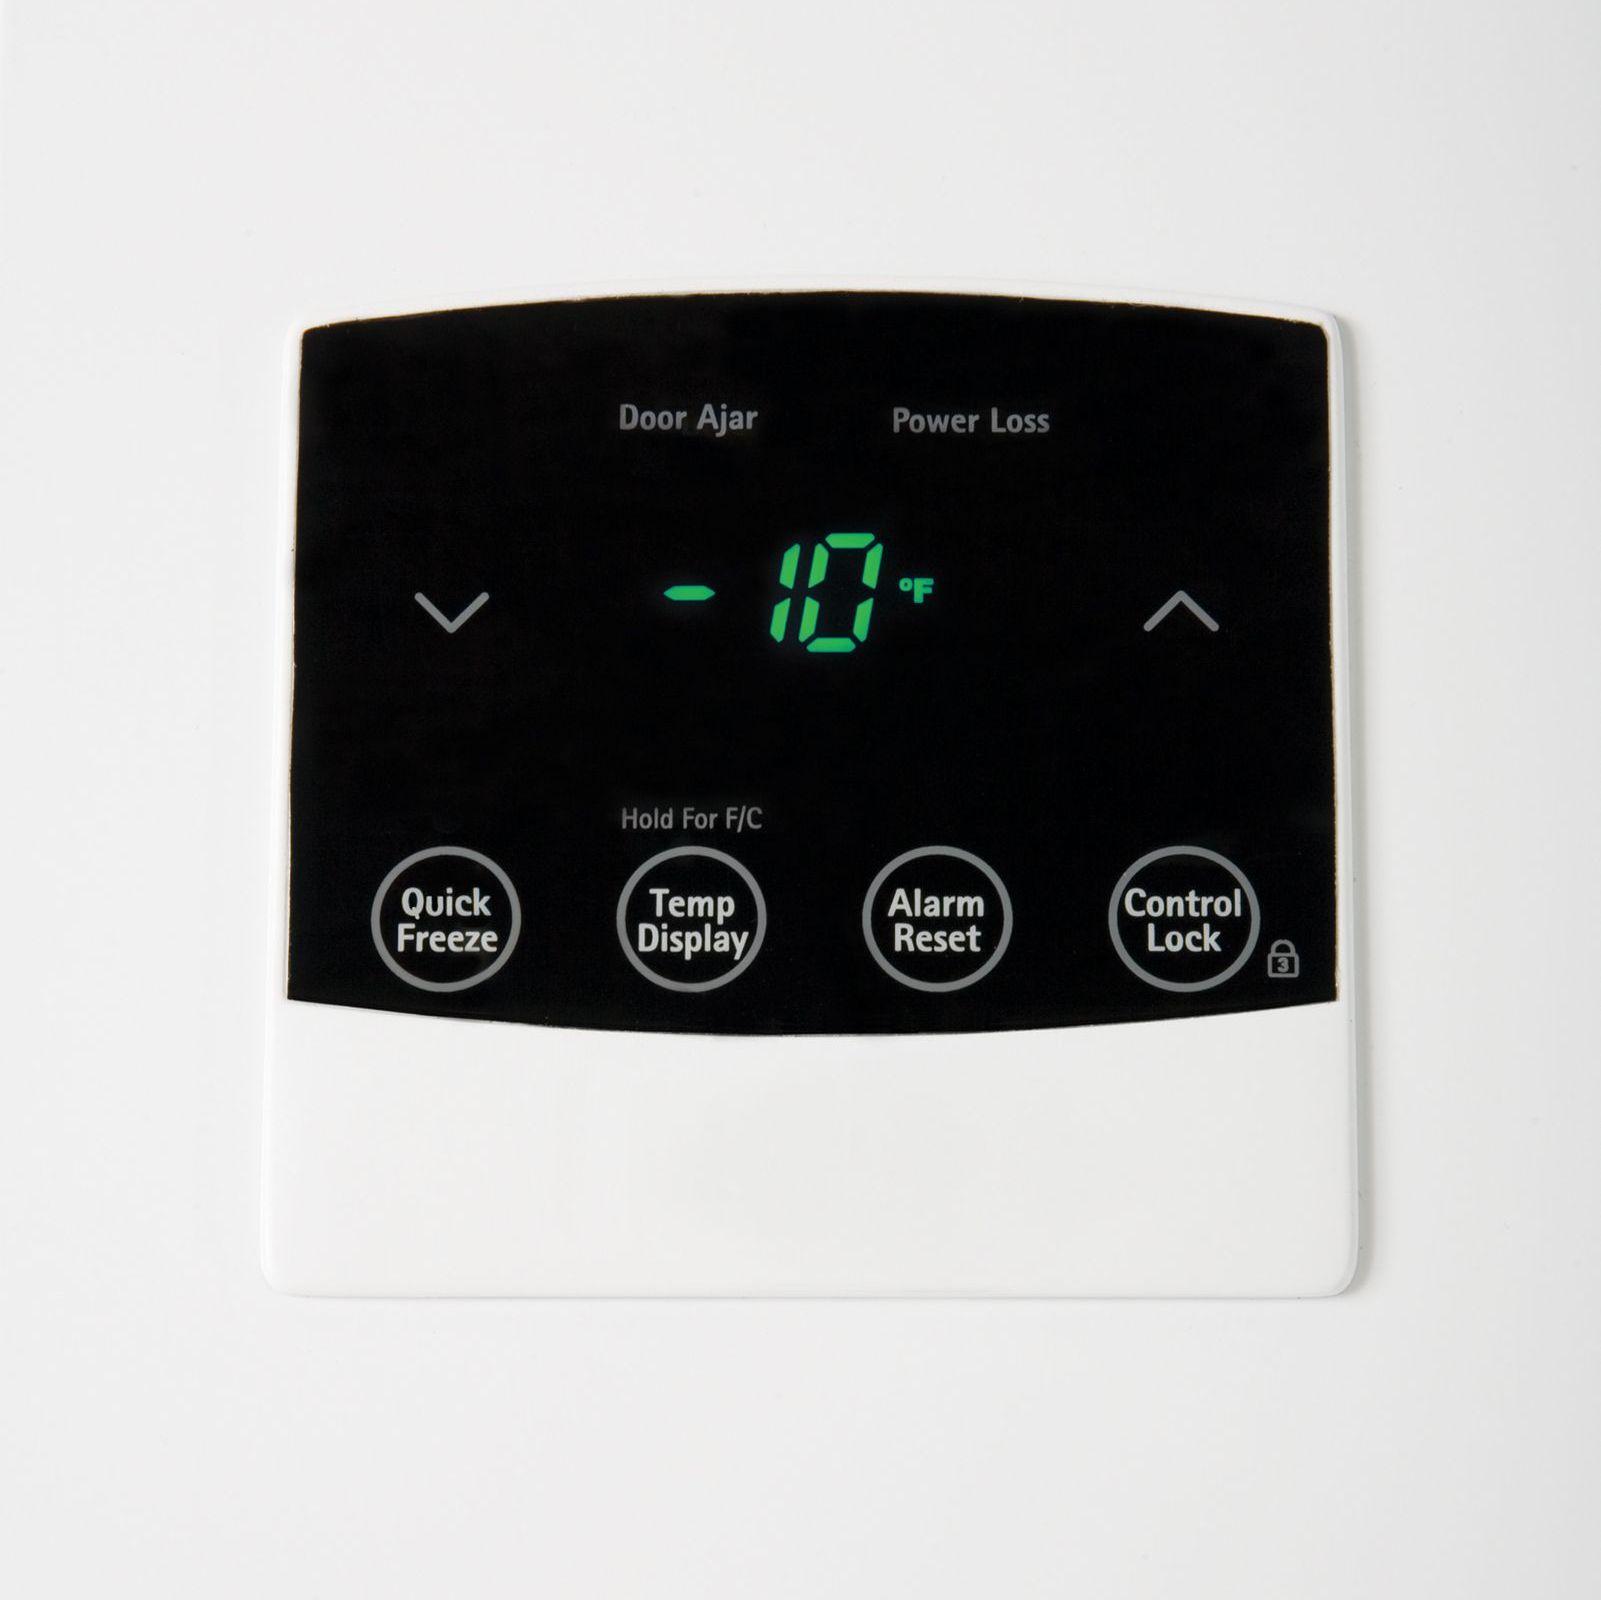 Kenmore Elite 28712 16 7 Cu Ft Upright Freezer